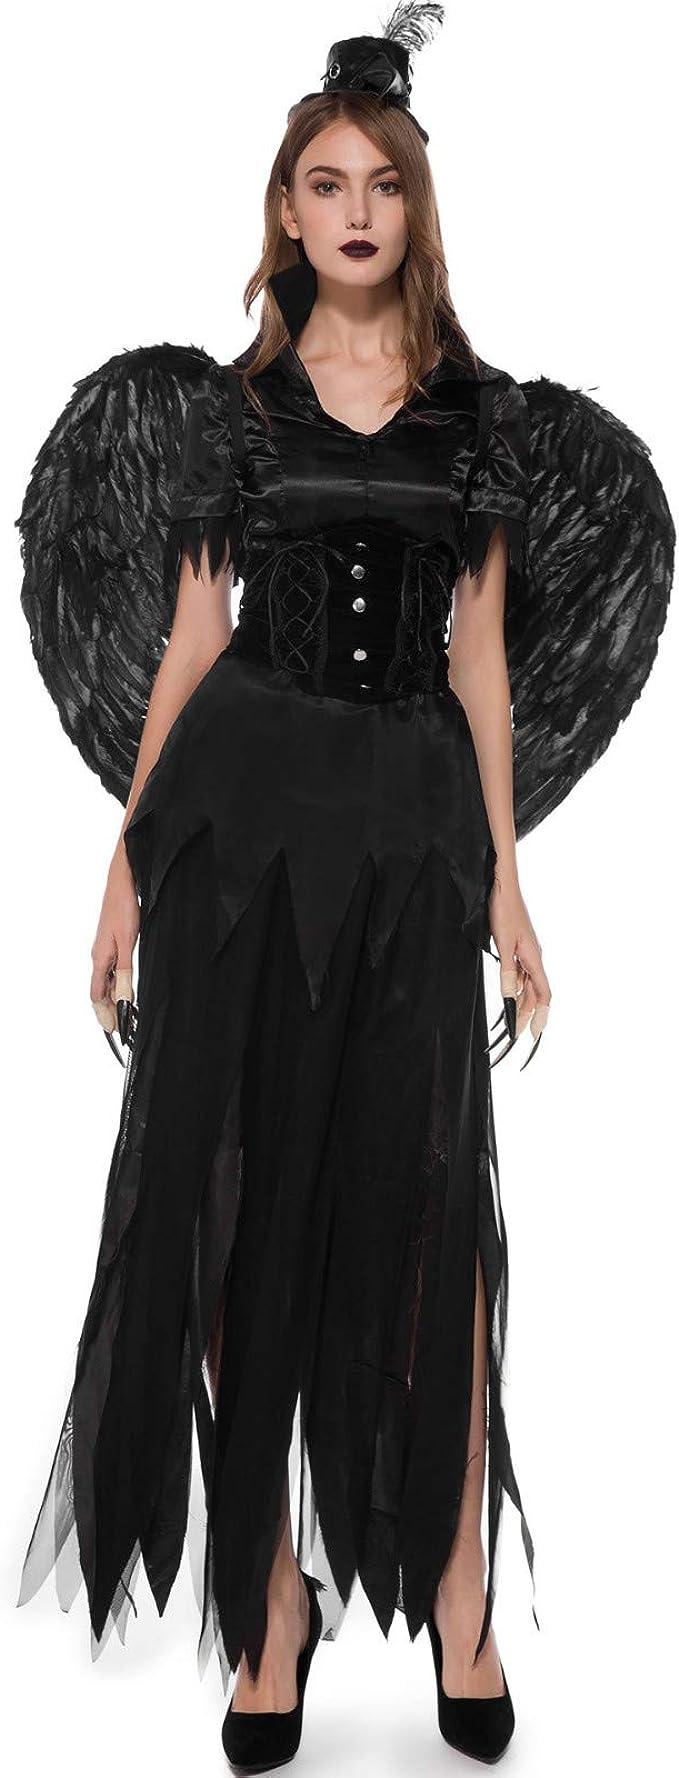 Goosun Disfraz De Carnaval Dama Disfraz De Halloween Ángel Oscuro ...